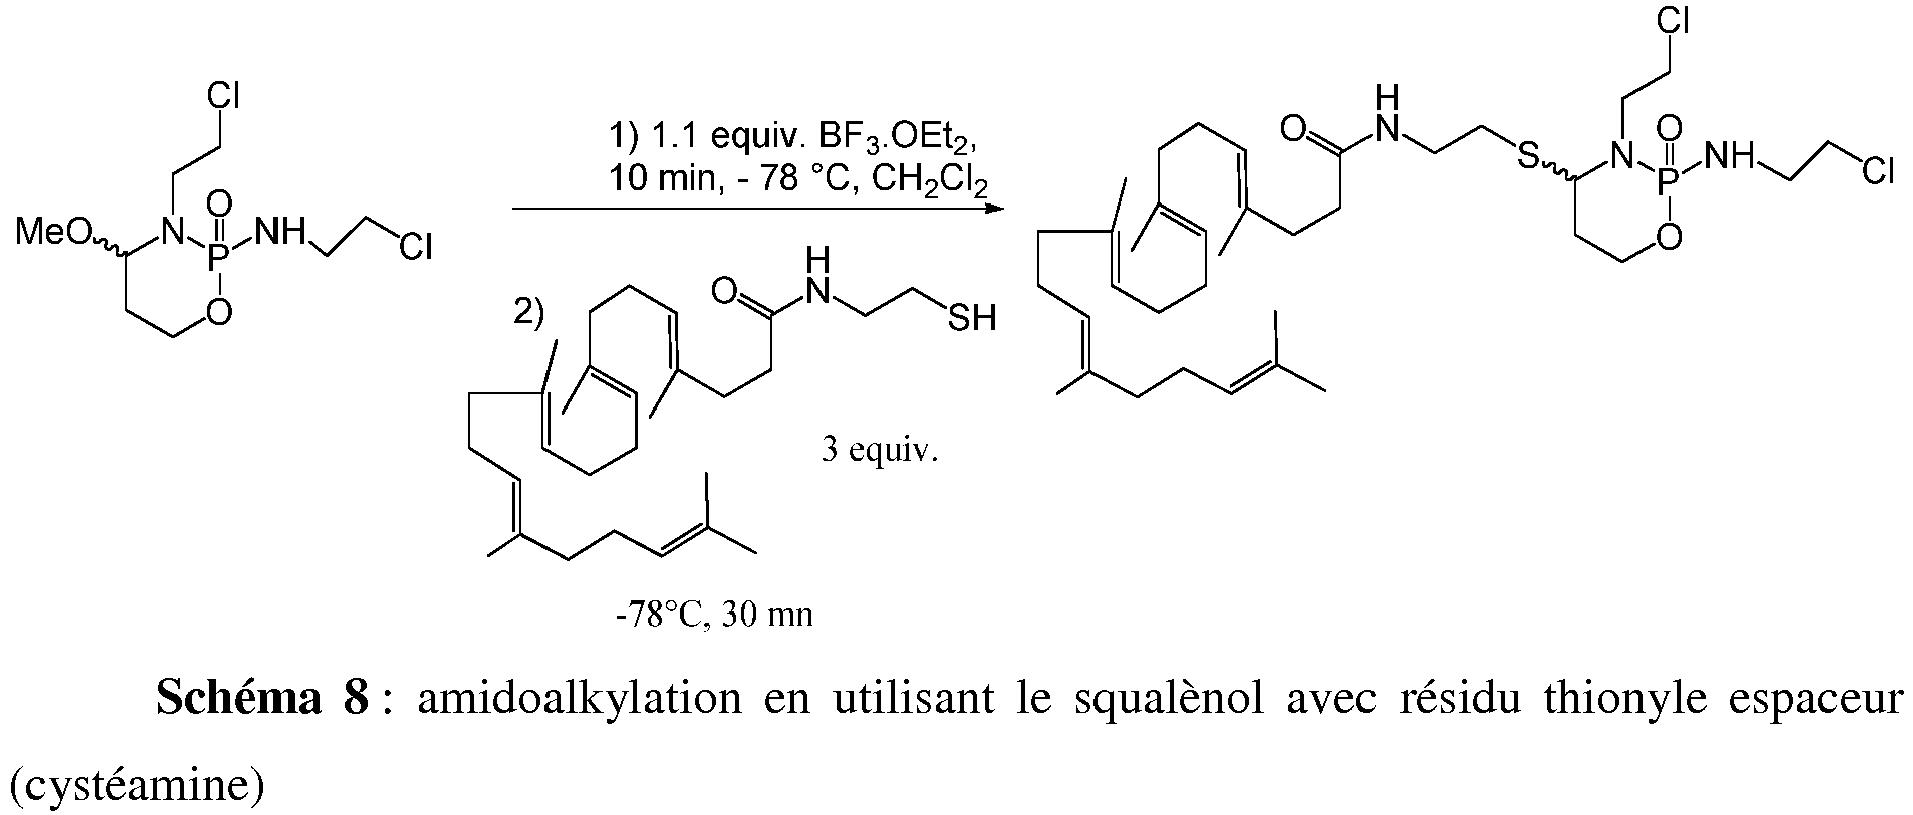 Ep2649084b1 Novel Derivatives Of Oxazaphosphorines That Are Pre